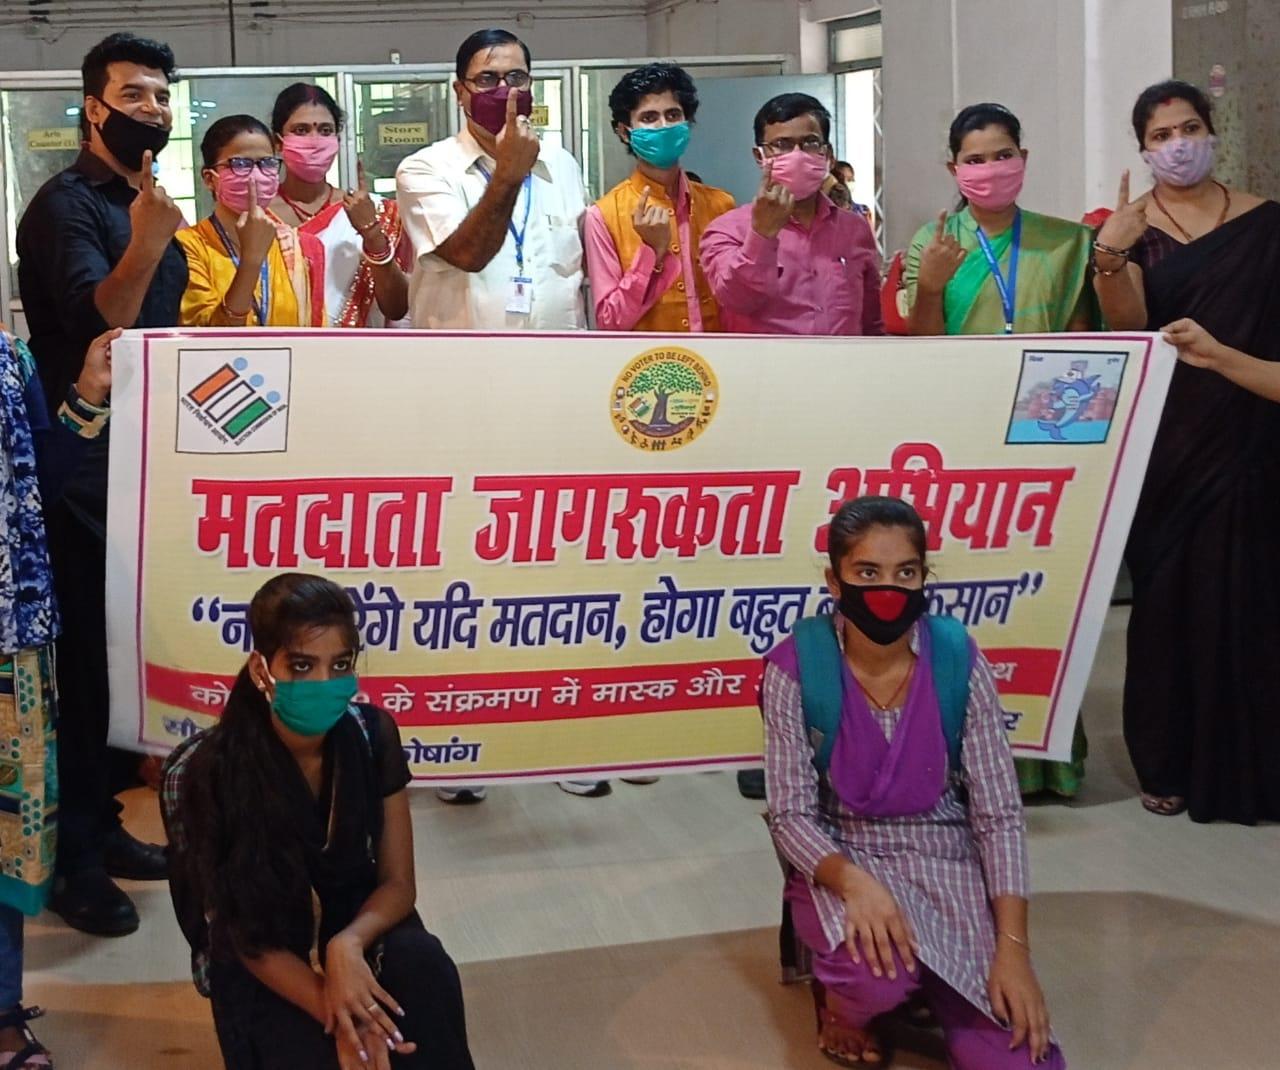 स्वीप कोषांग द्वारा चलाया गया जागरूकता अभियान,युवा महिला मतदाताओं को किया गया जागरूक,